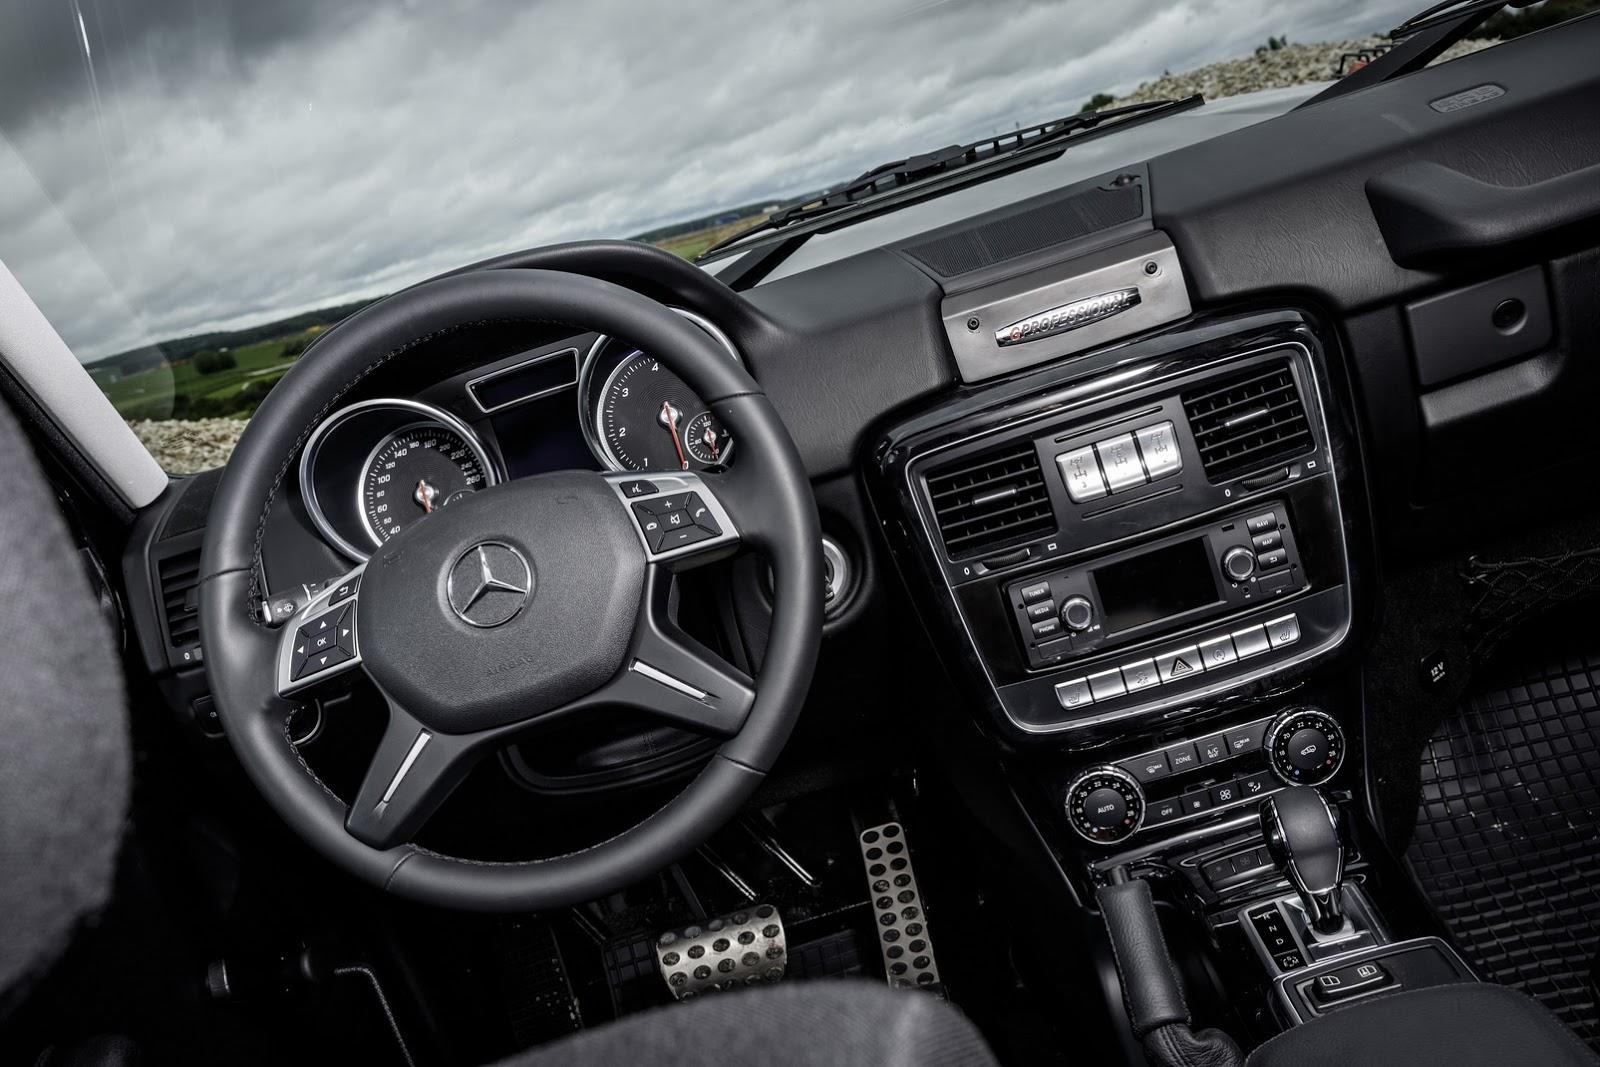 New 2017 Mercedes Benz G350d Professional Brings G Class